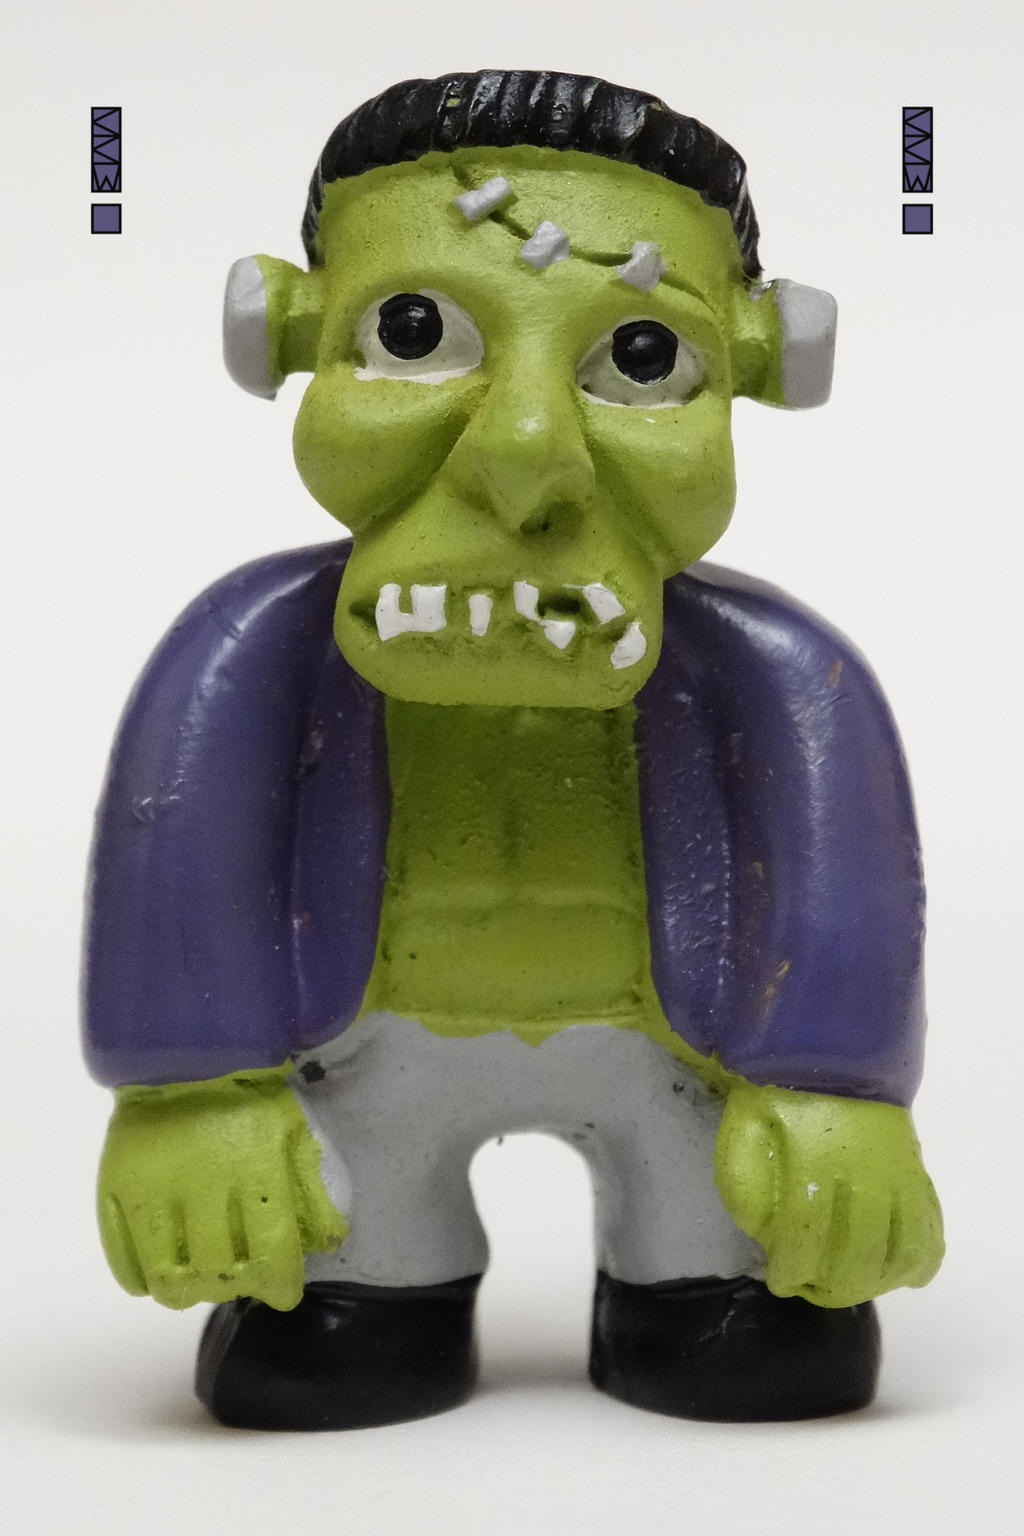 !Frankenstein surprised! by Crigger